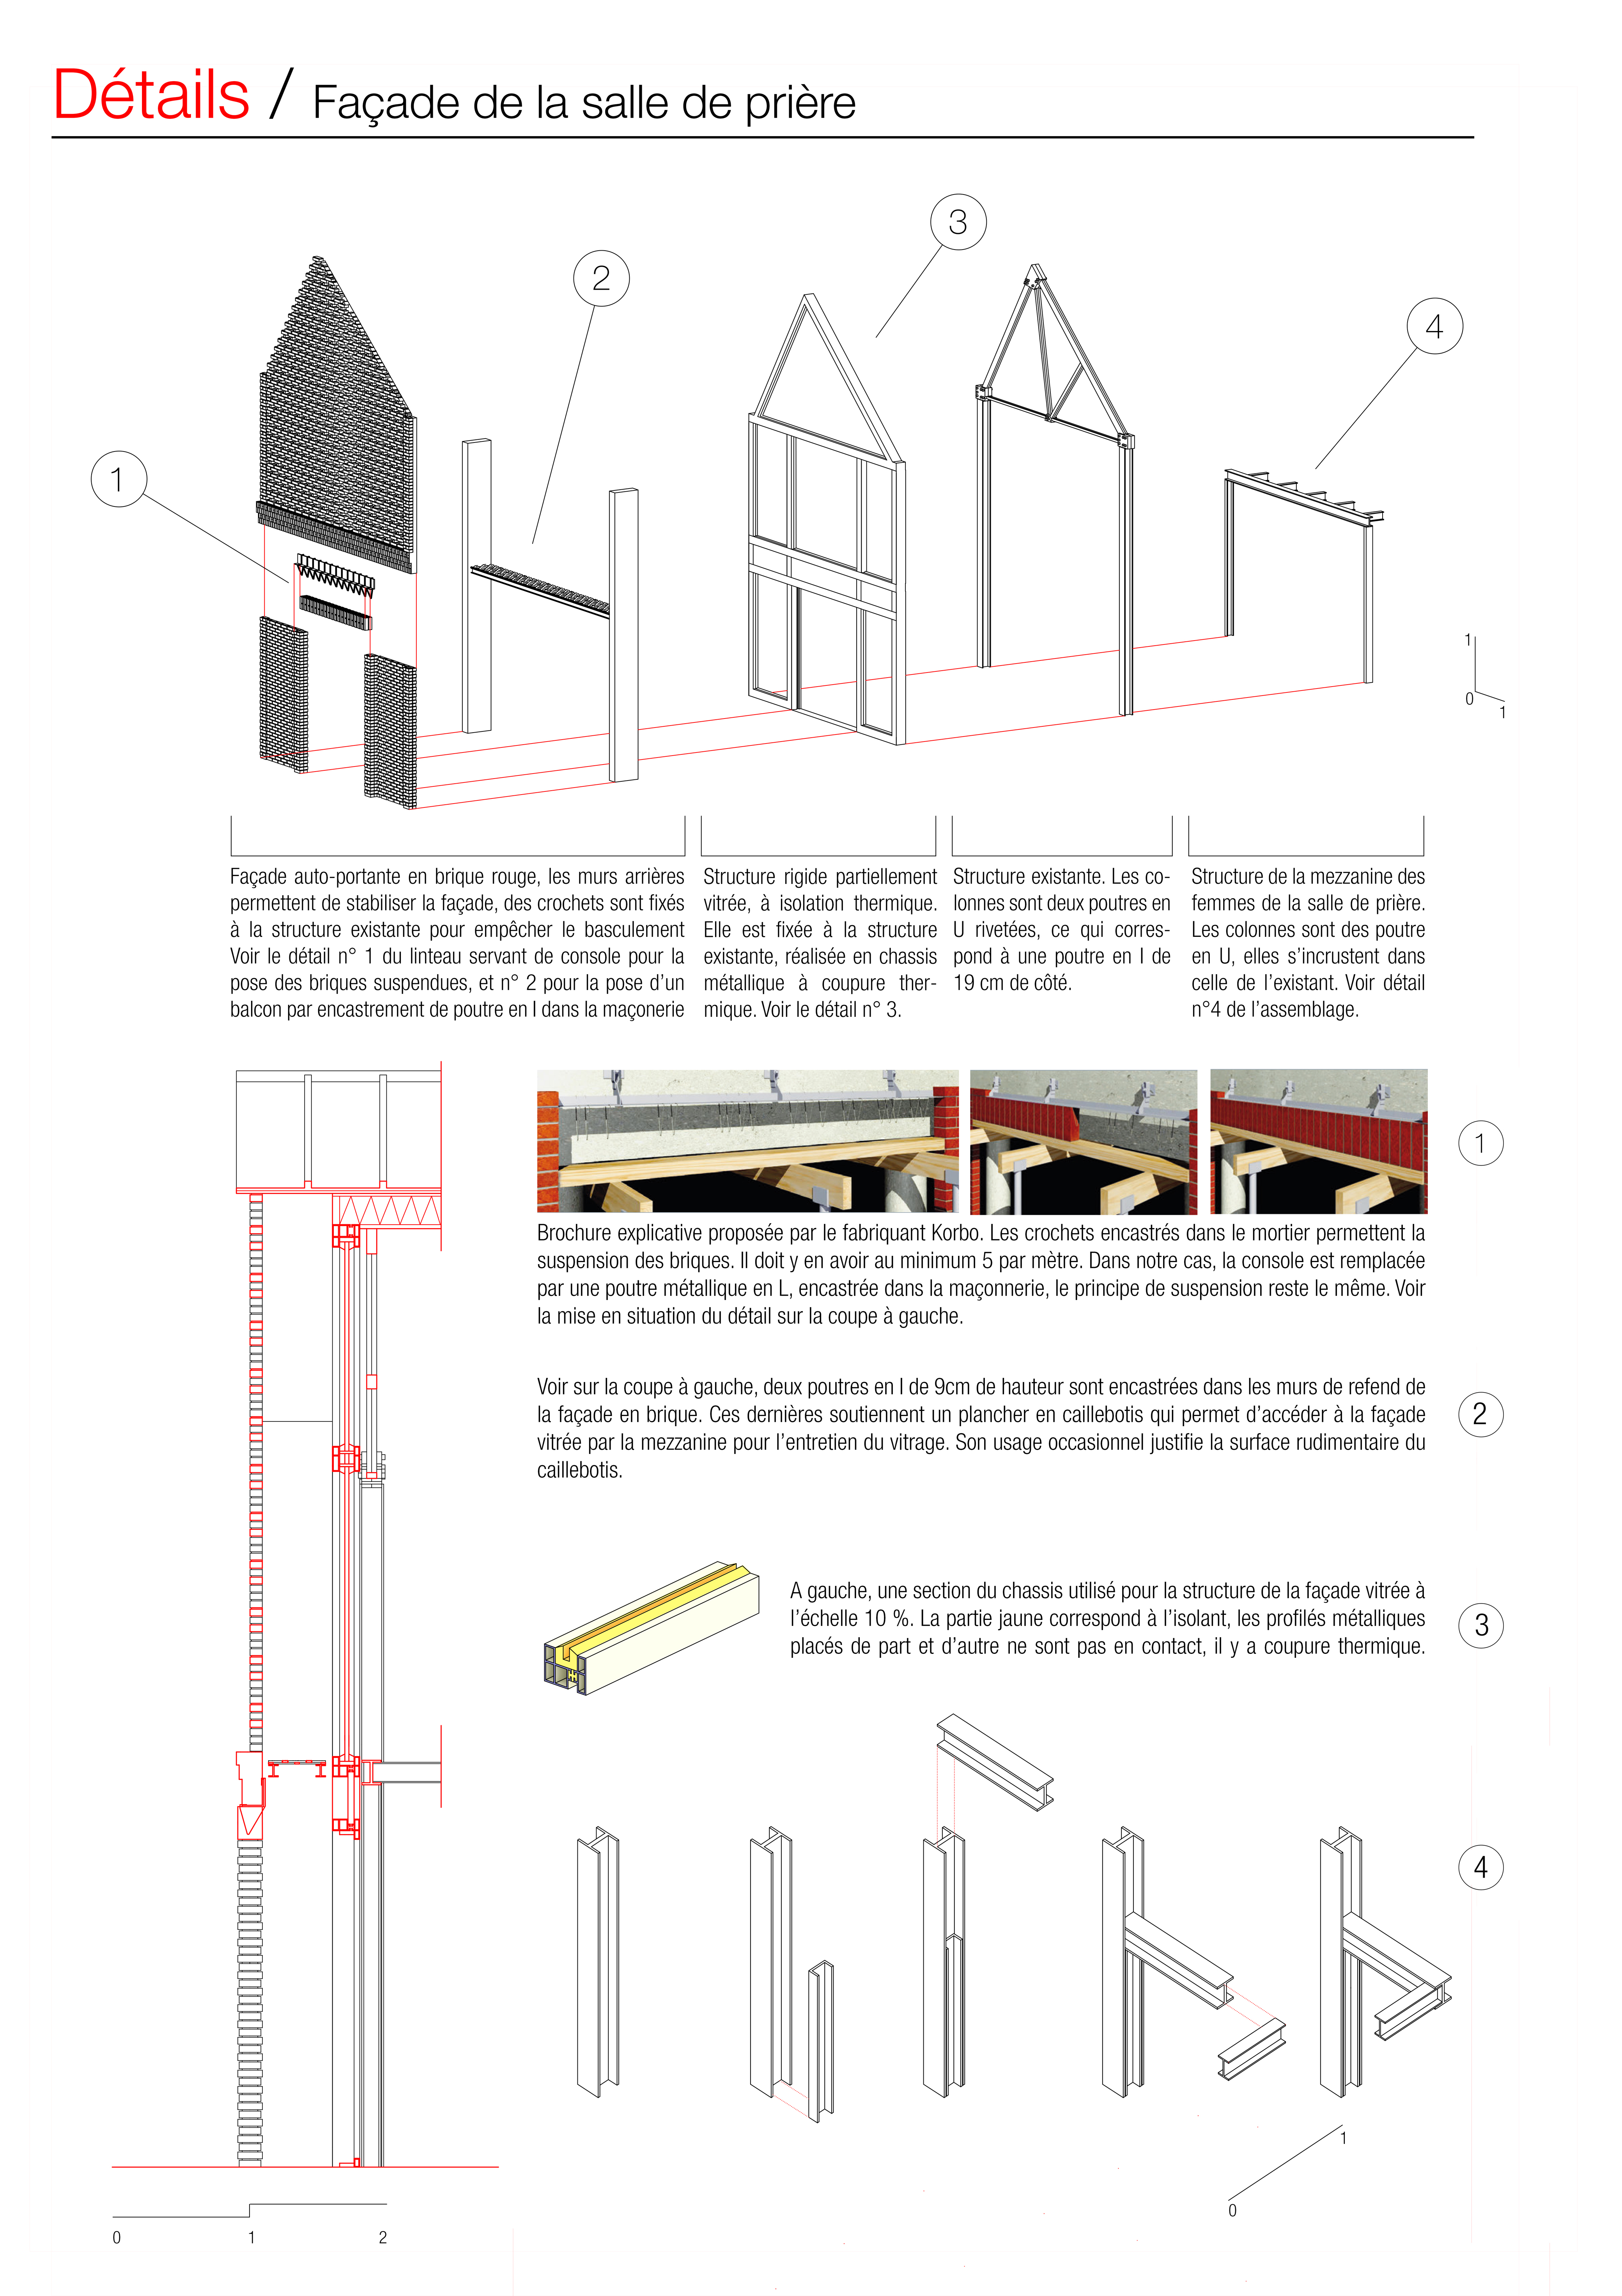 A1 planche details façade